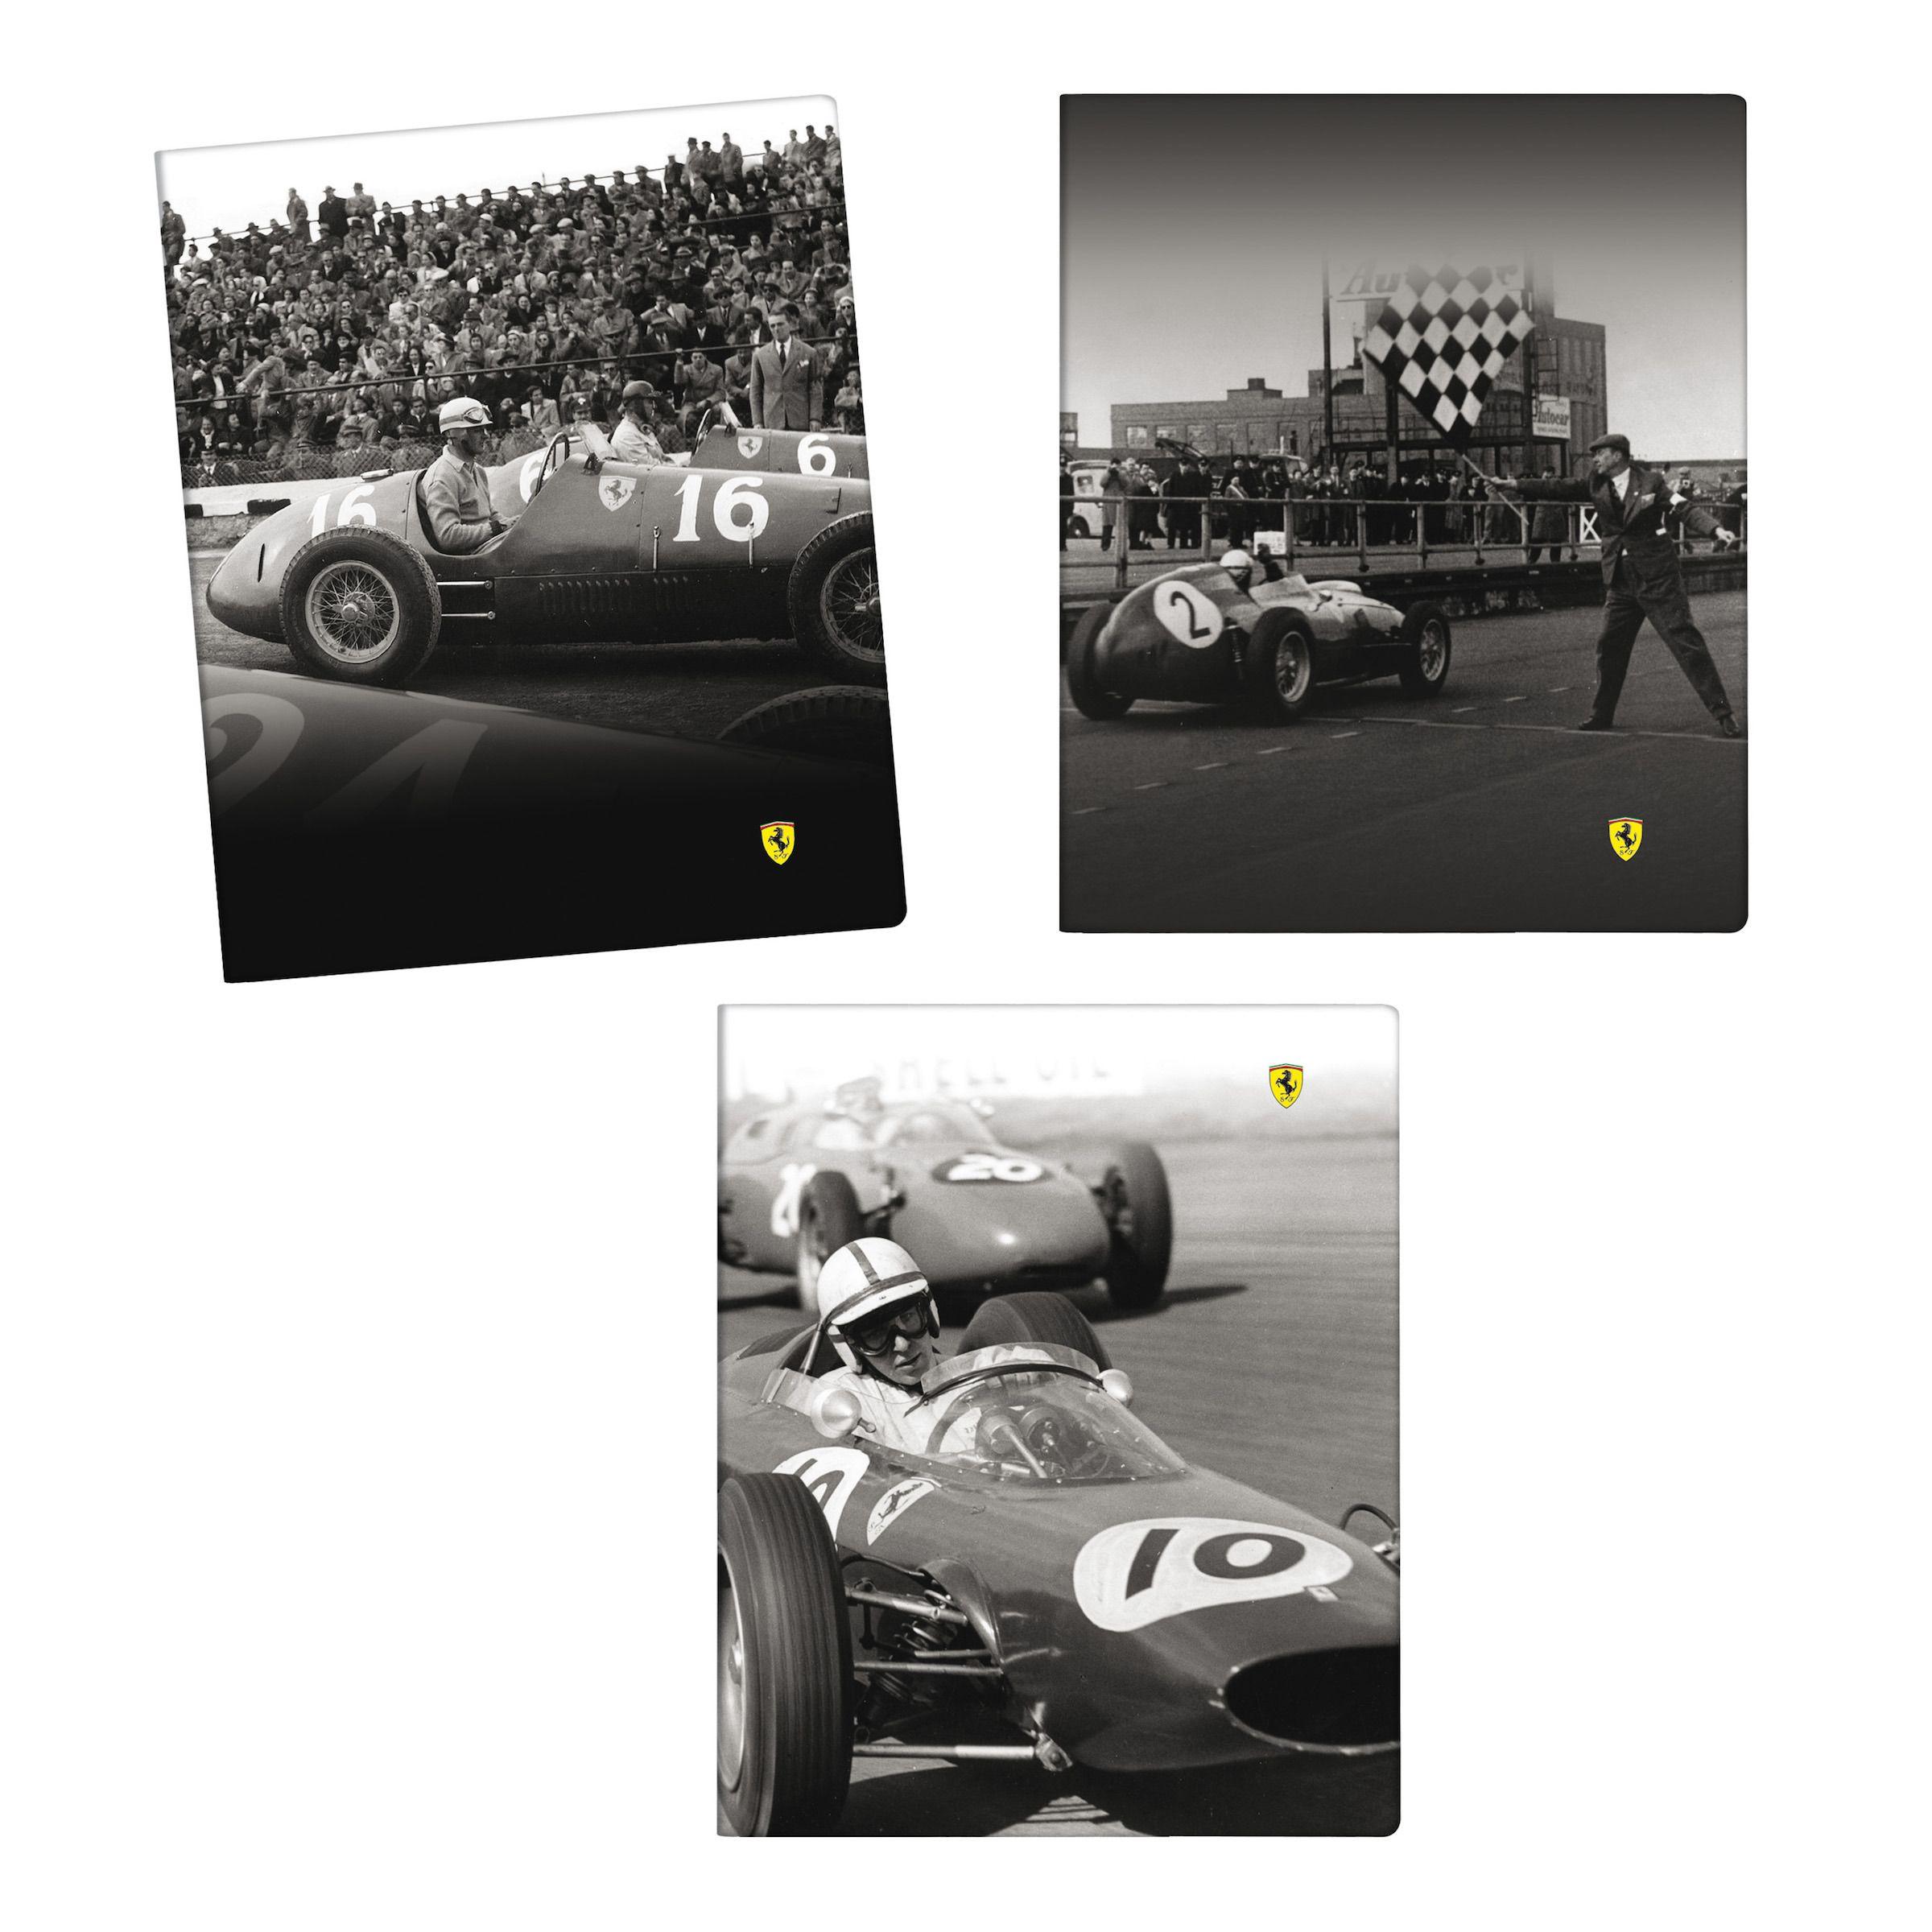 Notatnik Ferrari Retro Collection   FERRARI HOME   Fbutik   Scuderia Ferrari Collection